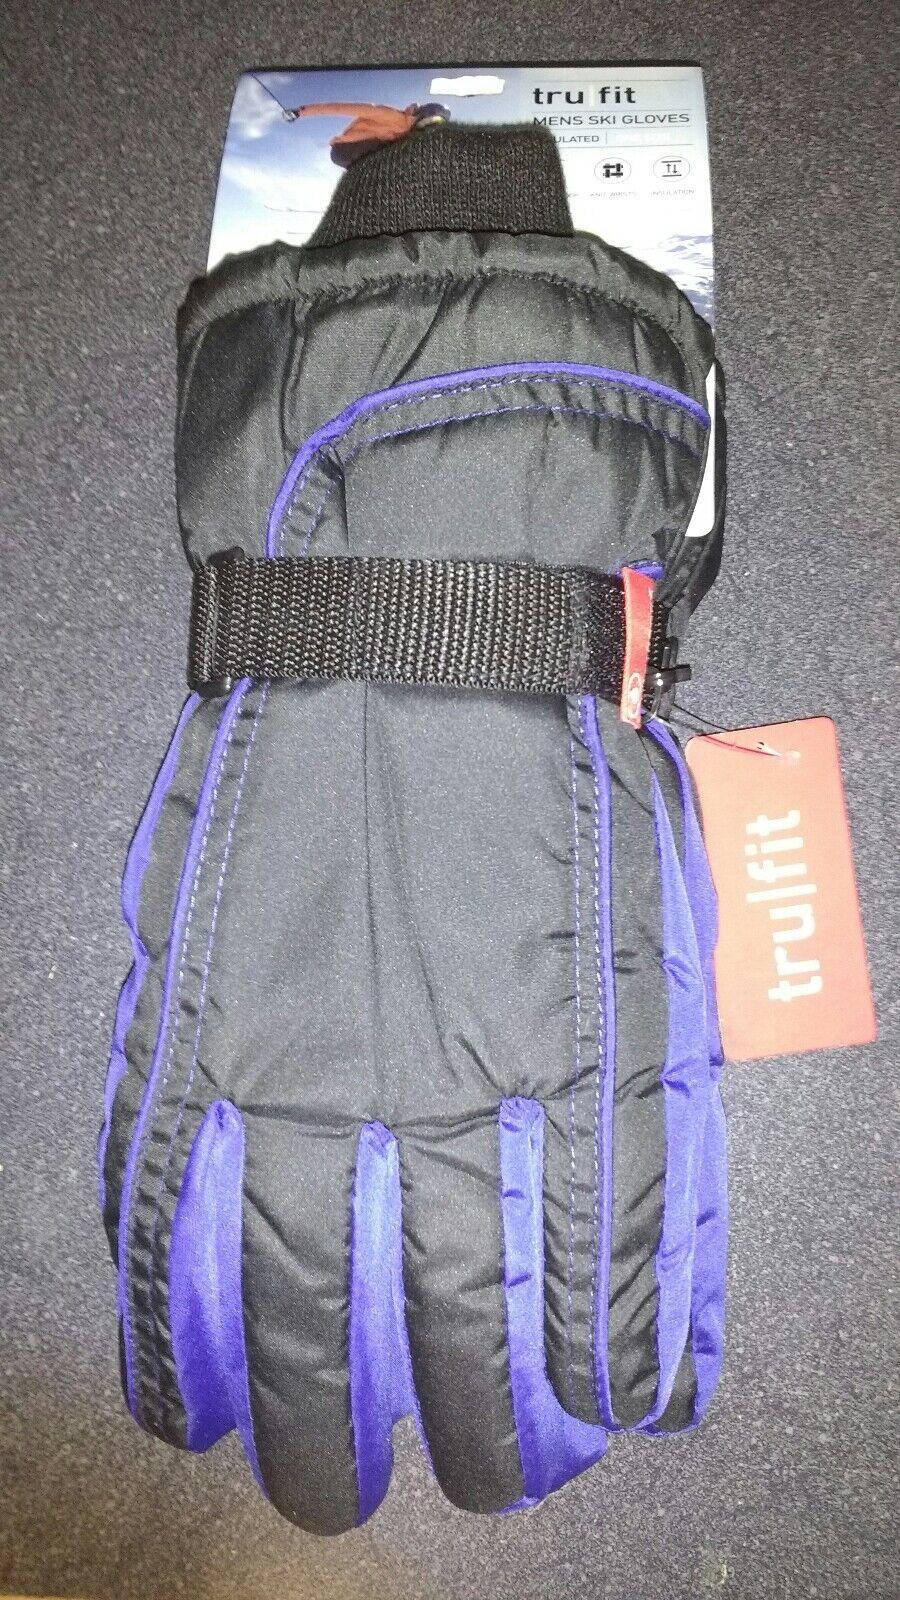 MENS TRUFIT Black Blue Warm Insulated Waterproof Winter Ski Gloves One Size